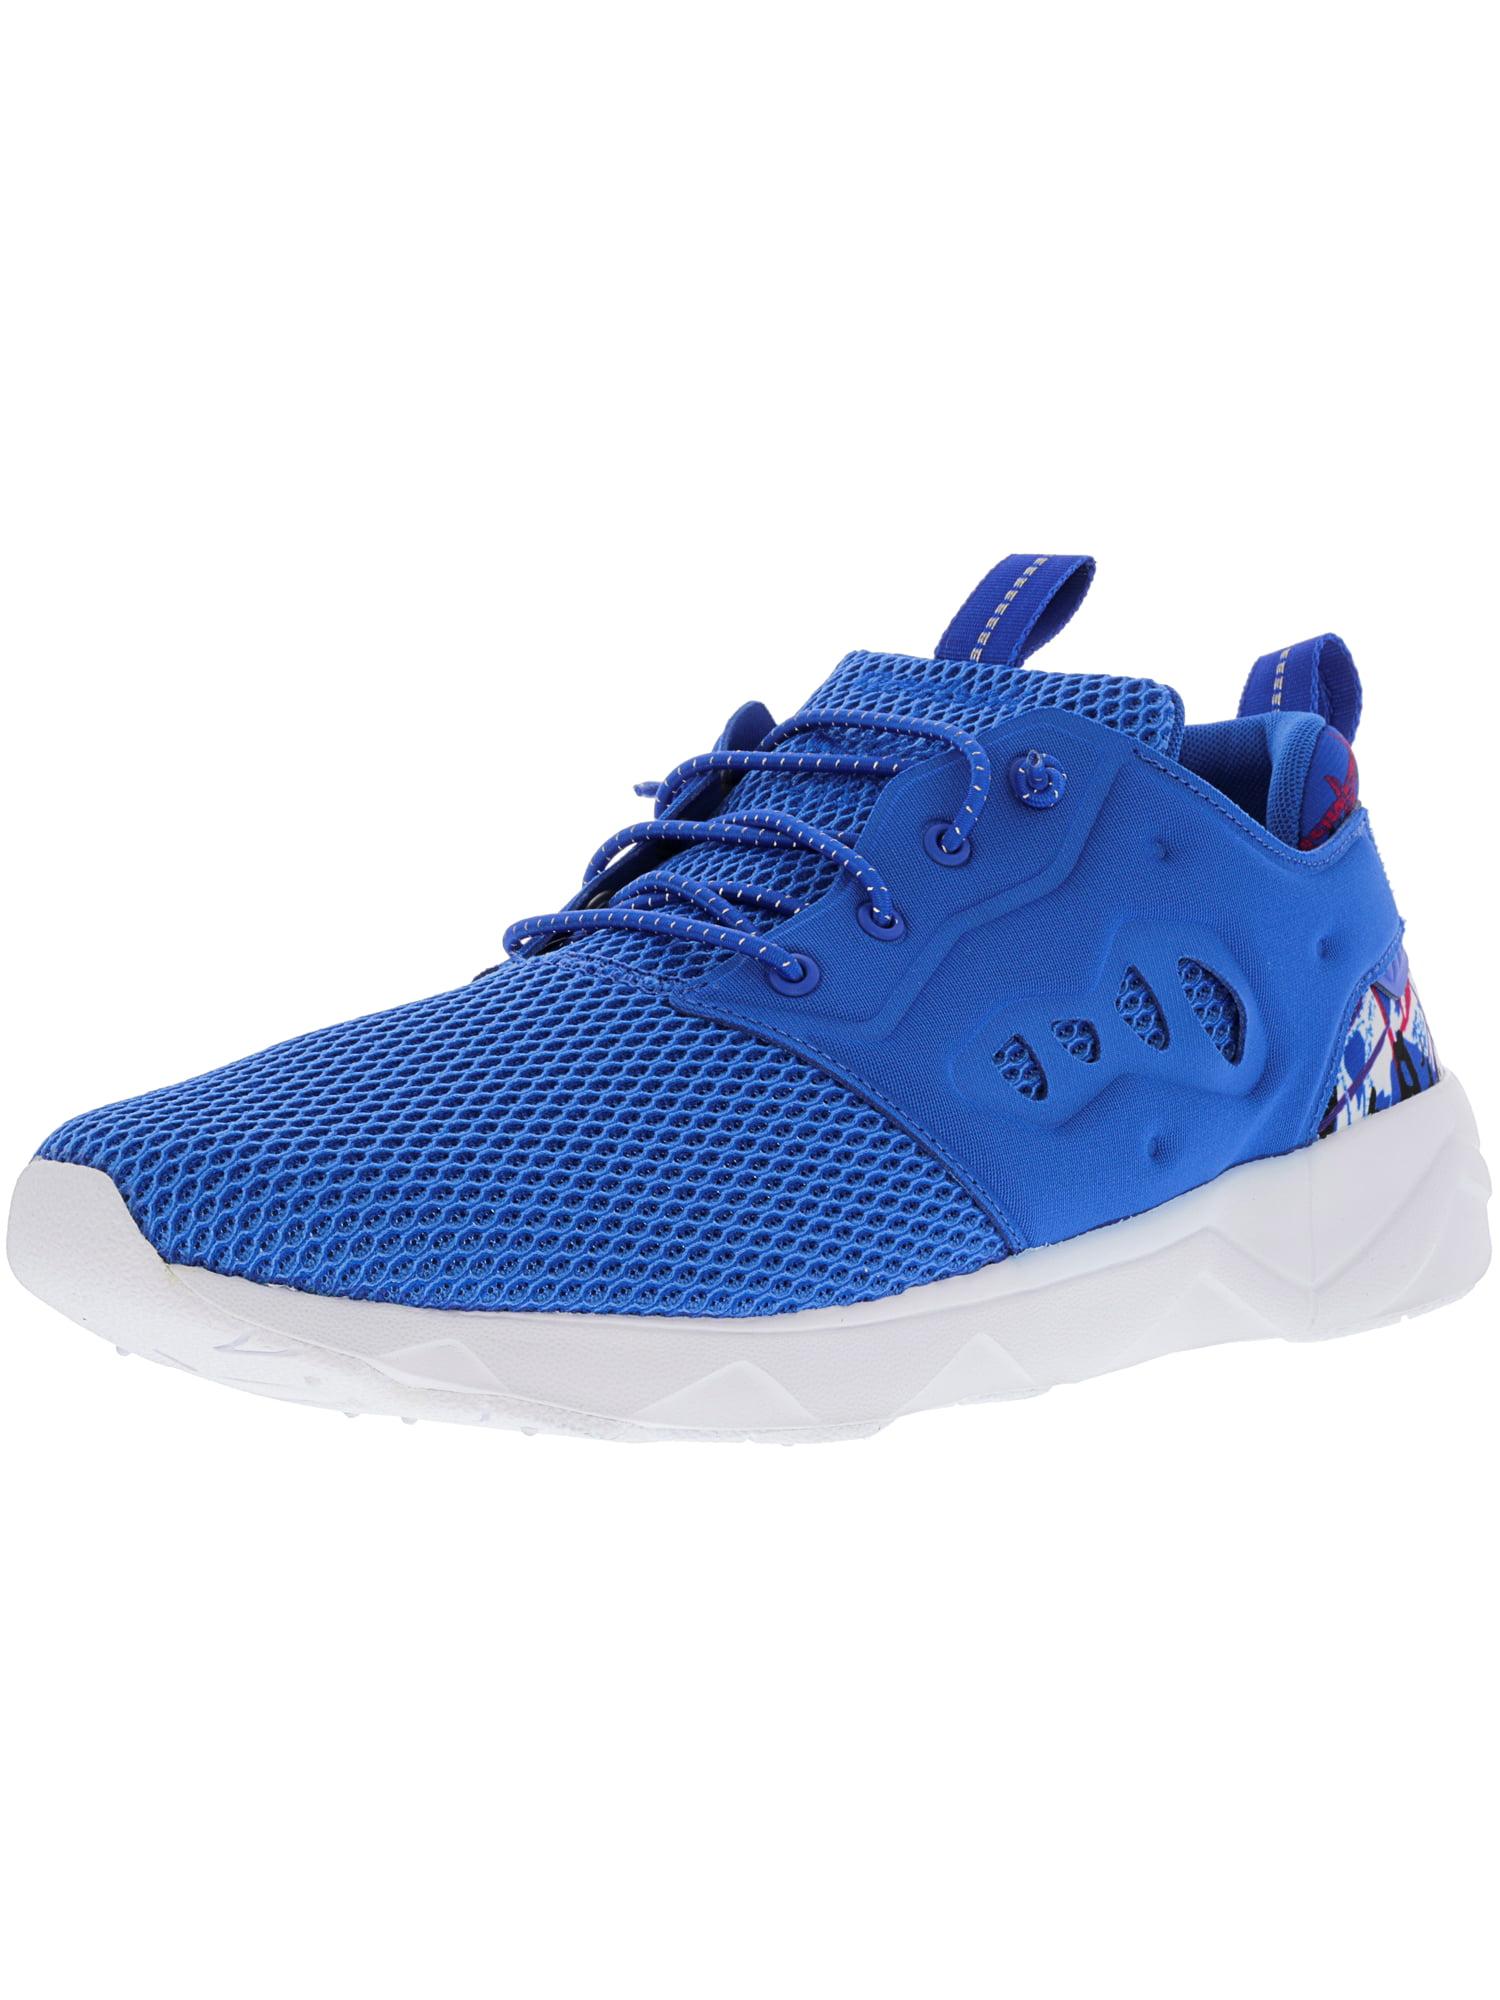 Reebok Men's Furylite Ii Ar Awesome Blue / White Black Ankle-High Slip-On Shoes - 8.5M